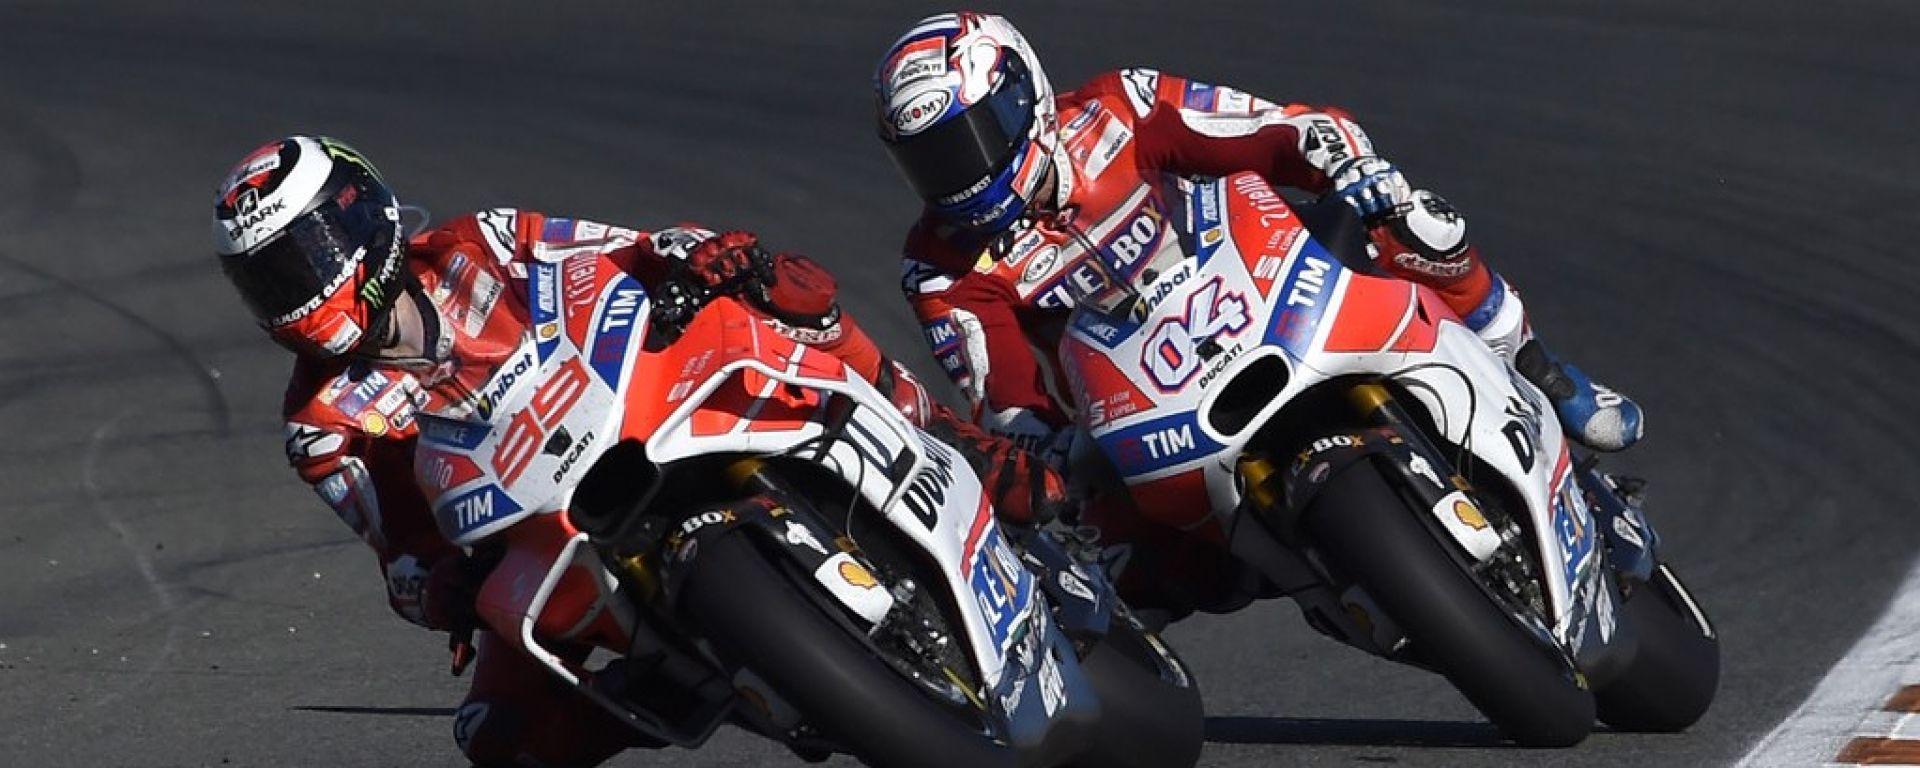 Team Ducati MotoGP